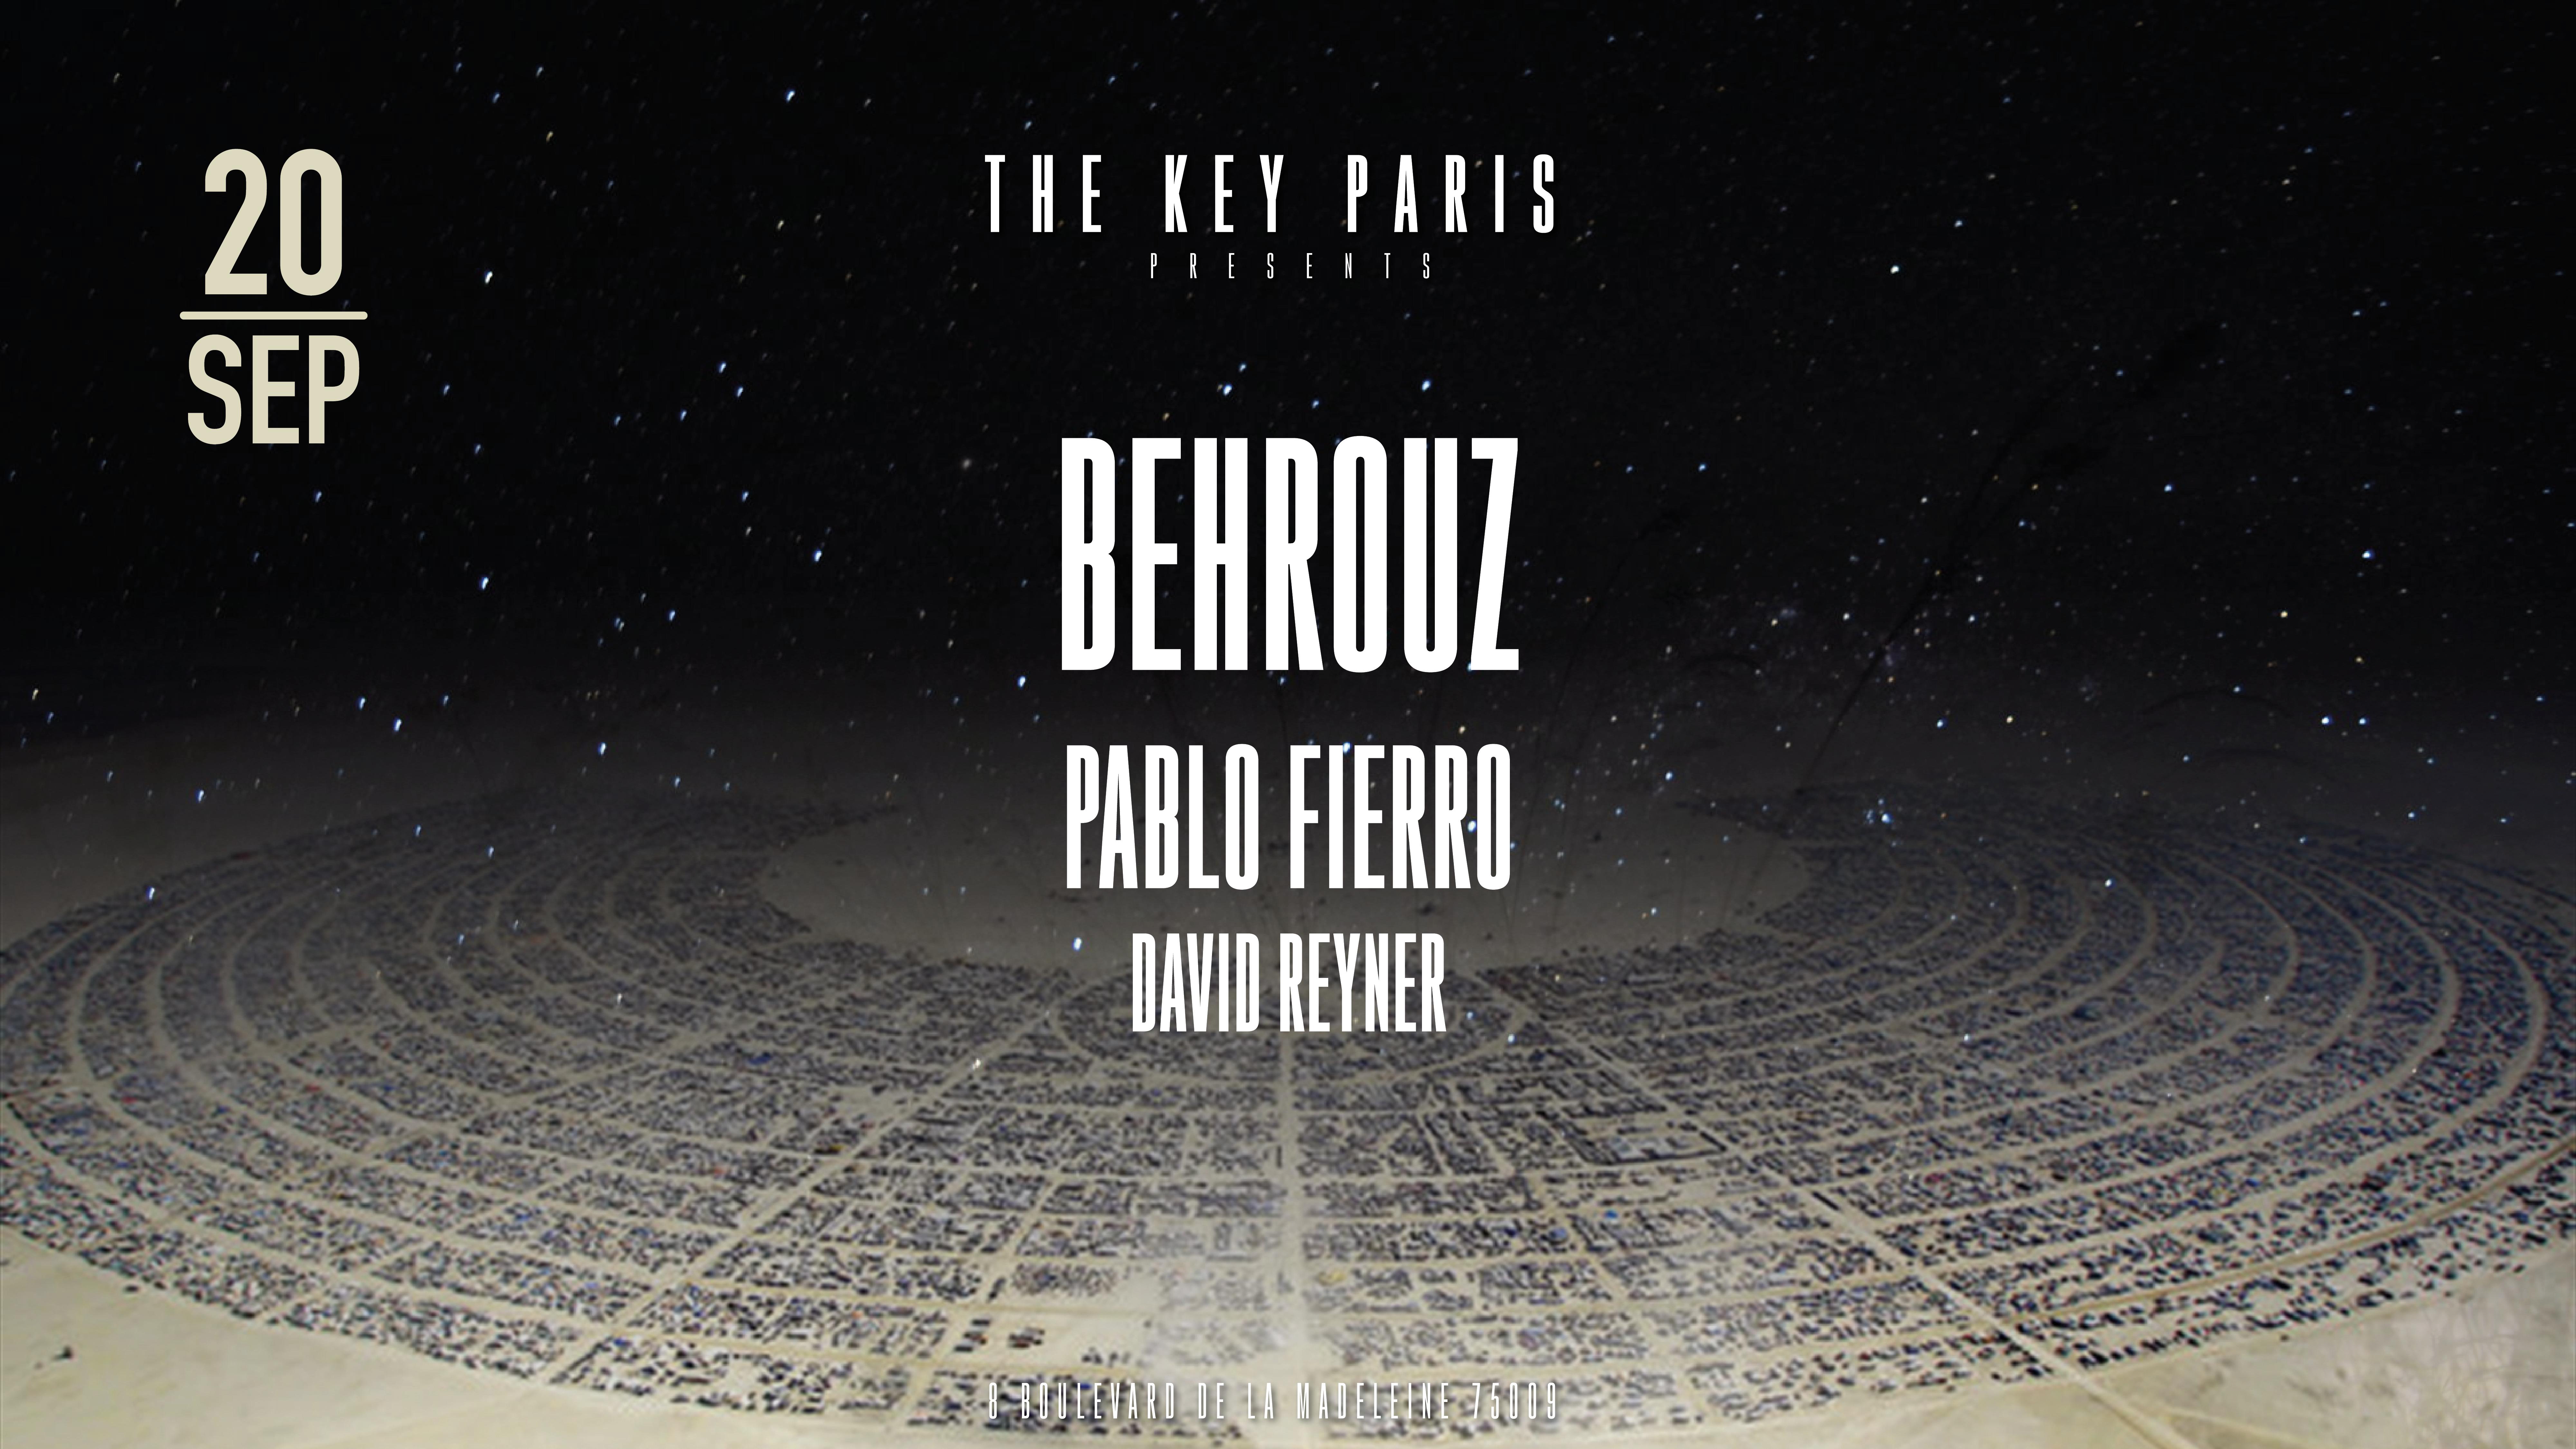 The Key Paris presents : The Burn with Behrouz & Pablo Fierro